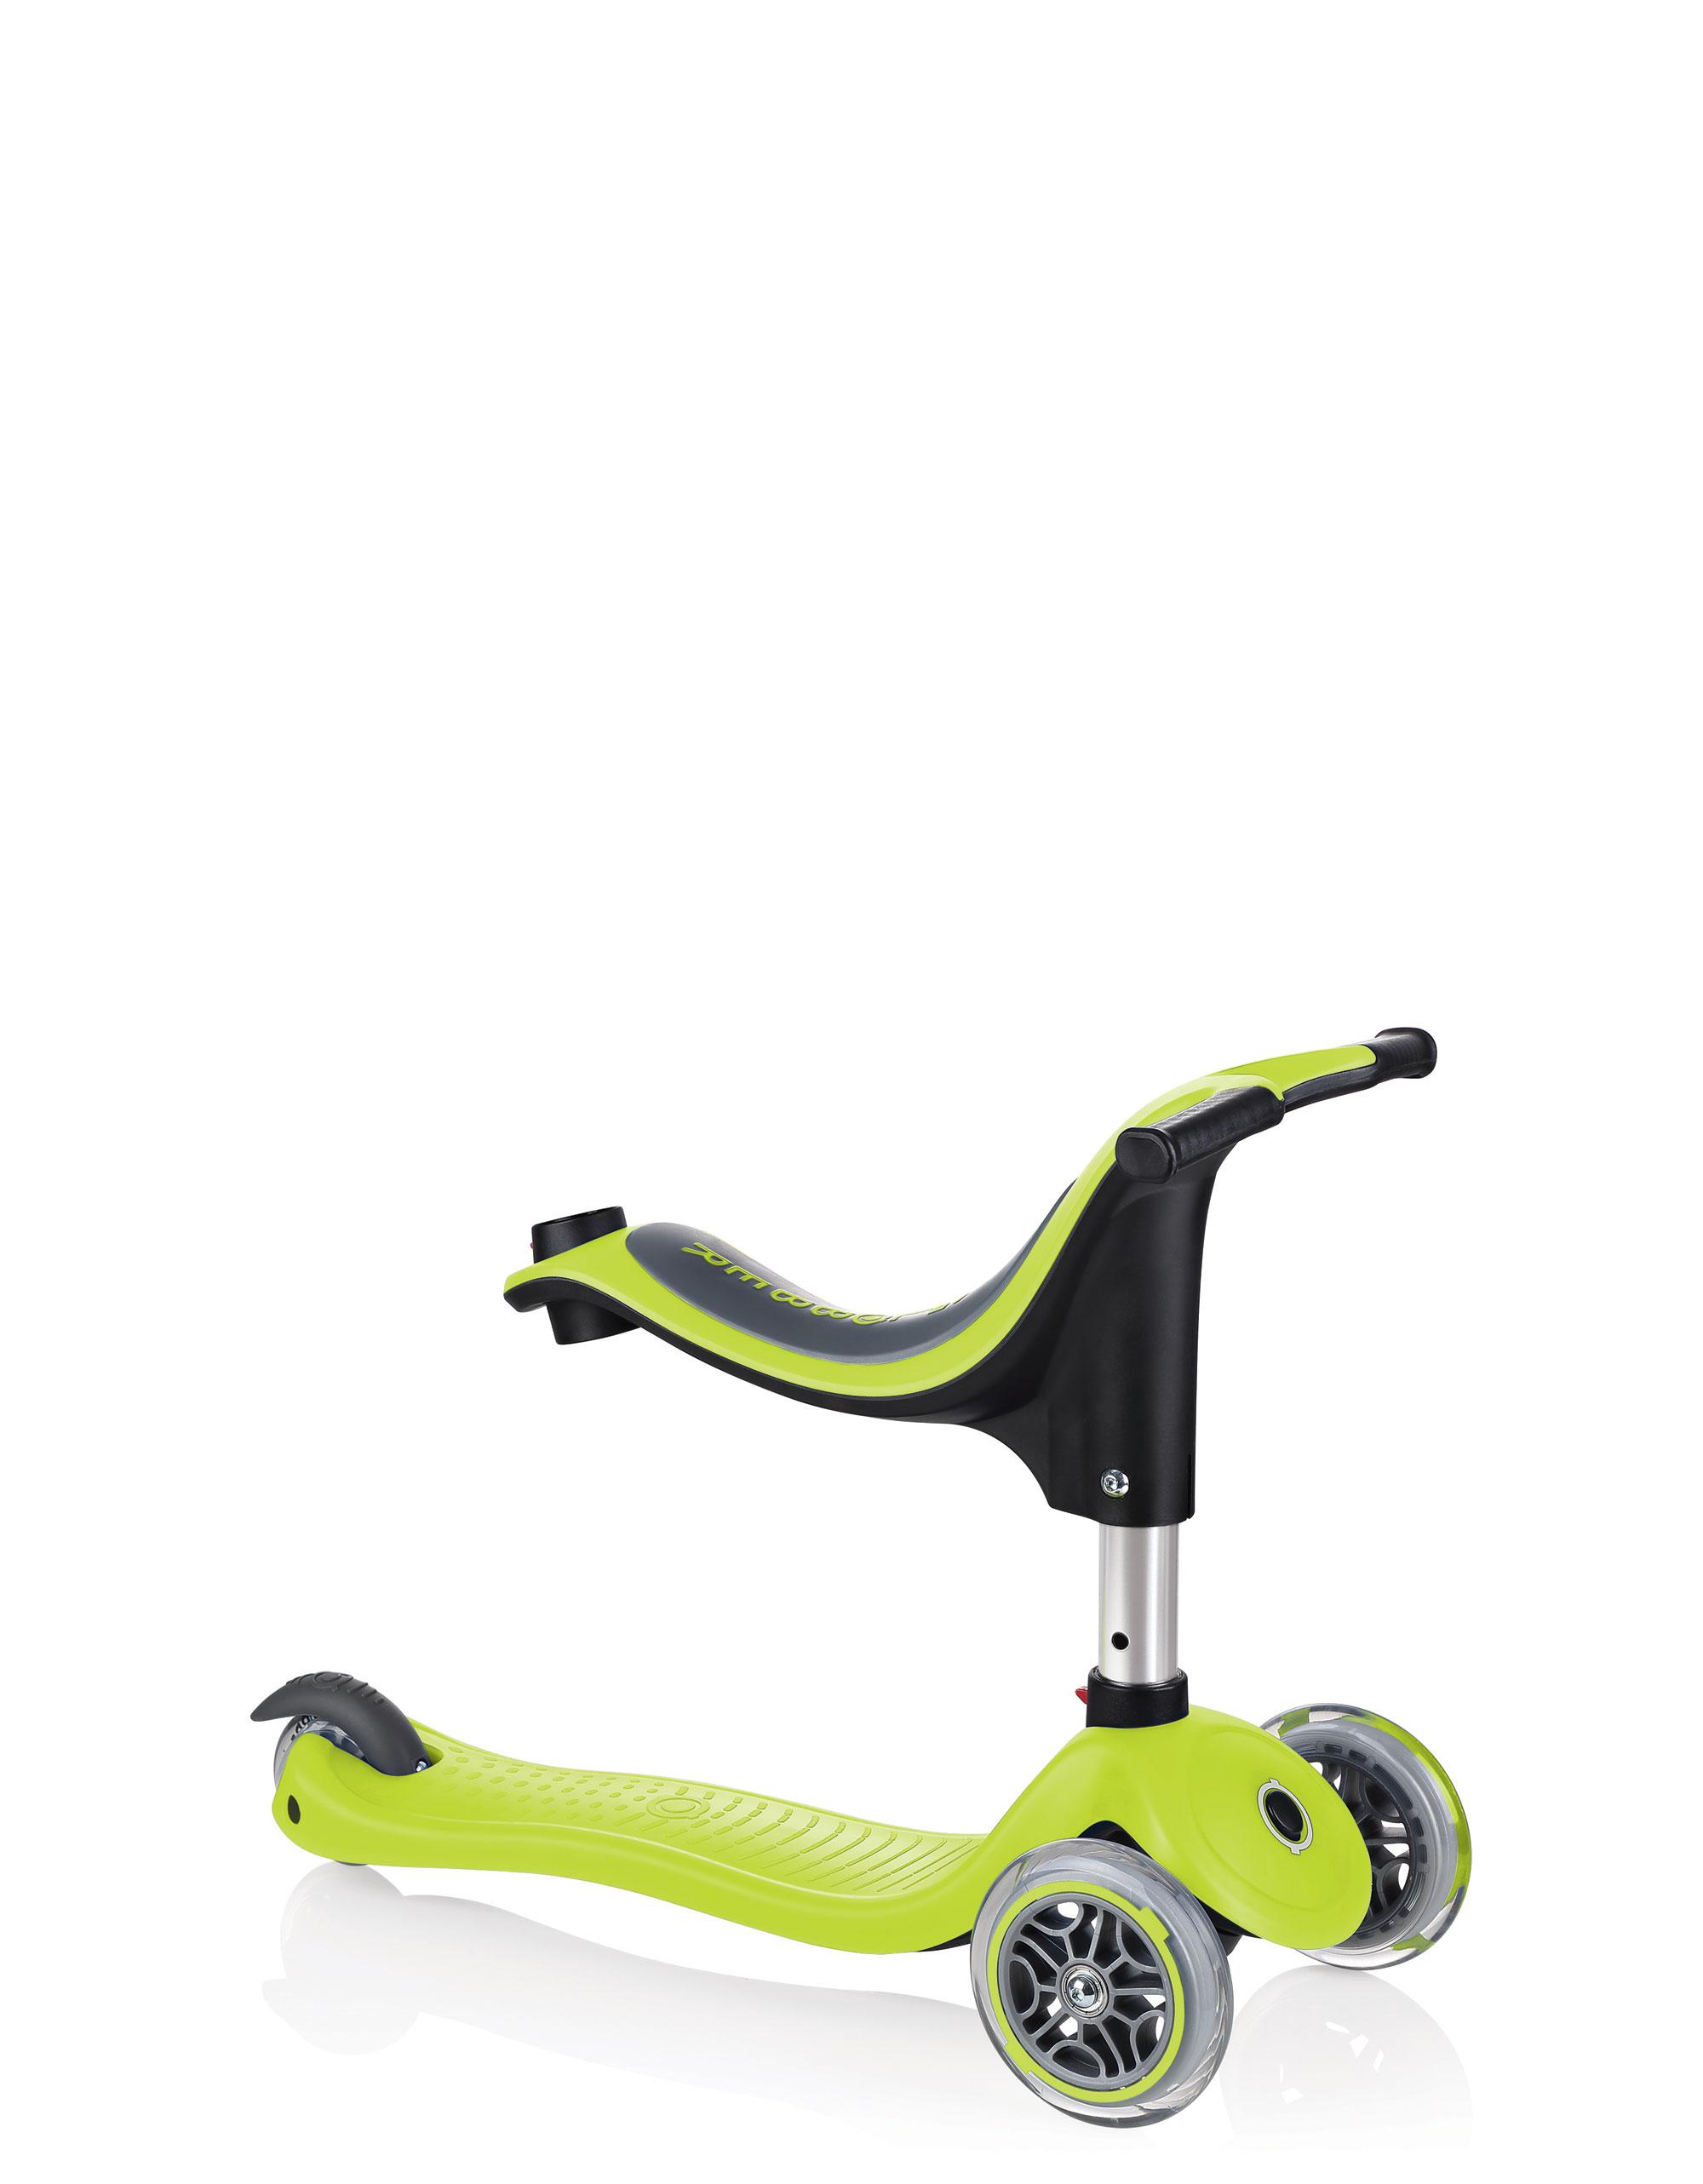 Scooter / Kinderroller / Dreirad / Laufrad Globber Evo 4in1 grün Set Bild 9